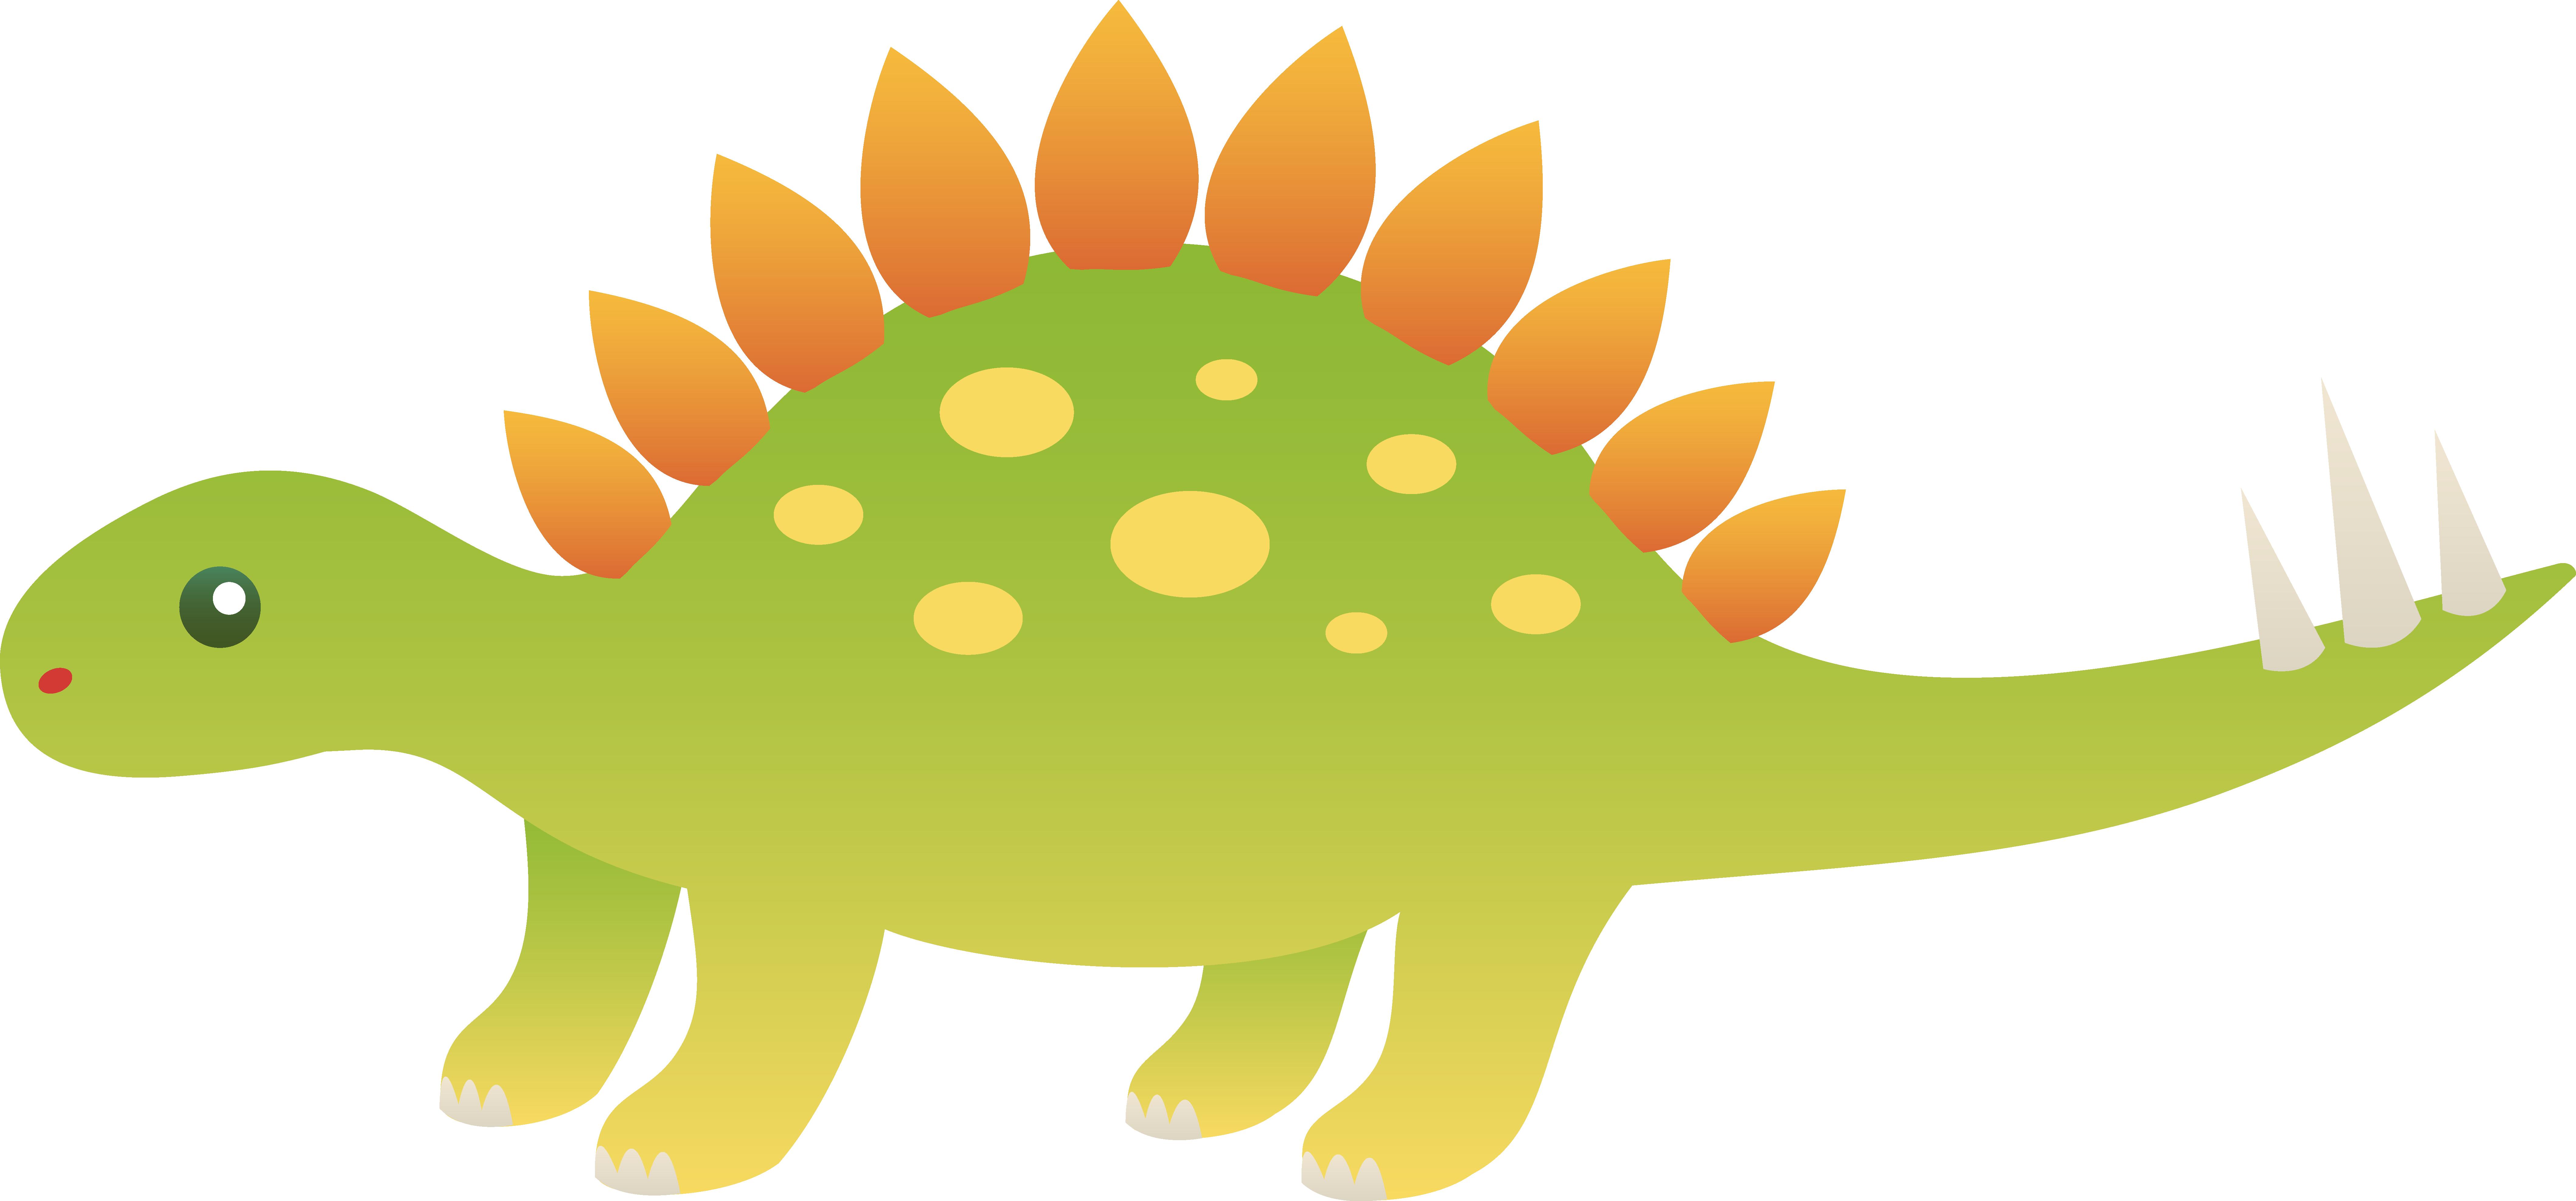 Free dinosaur clipart clip art pictures -Free dinosaur clipart clip art pictures graphics and illustrations 2 - Clipartix-11